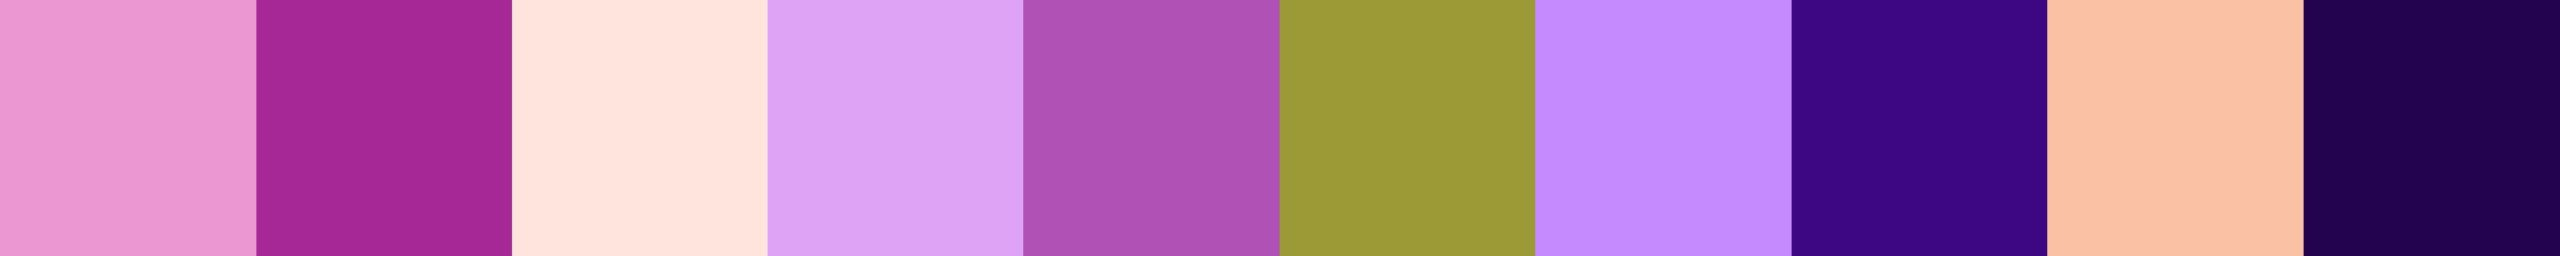 68 Nilaria Color Palette